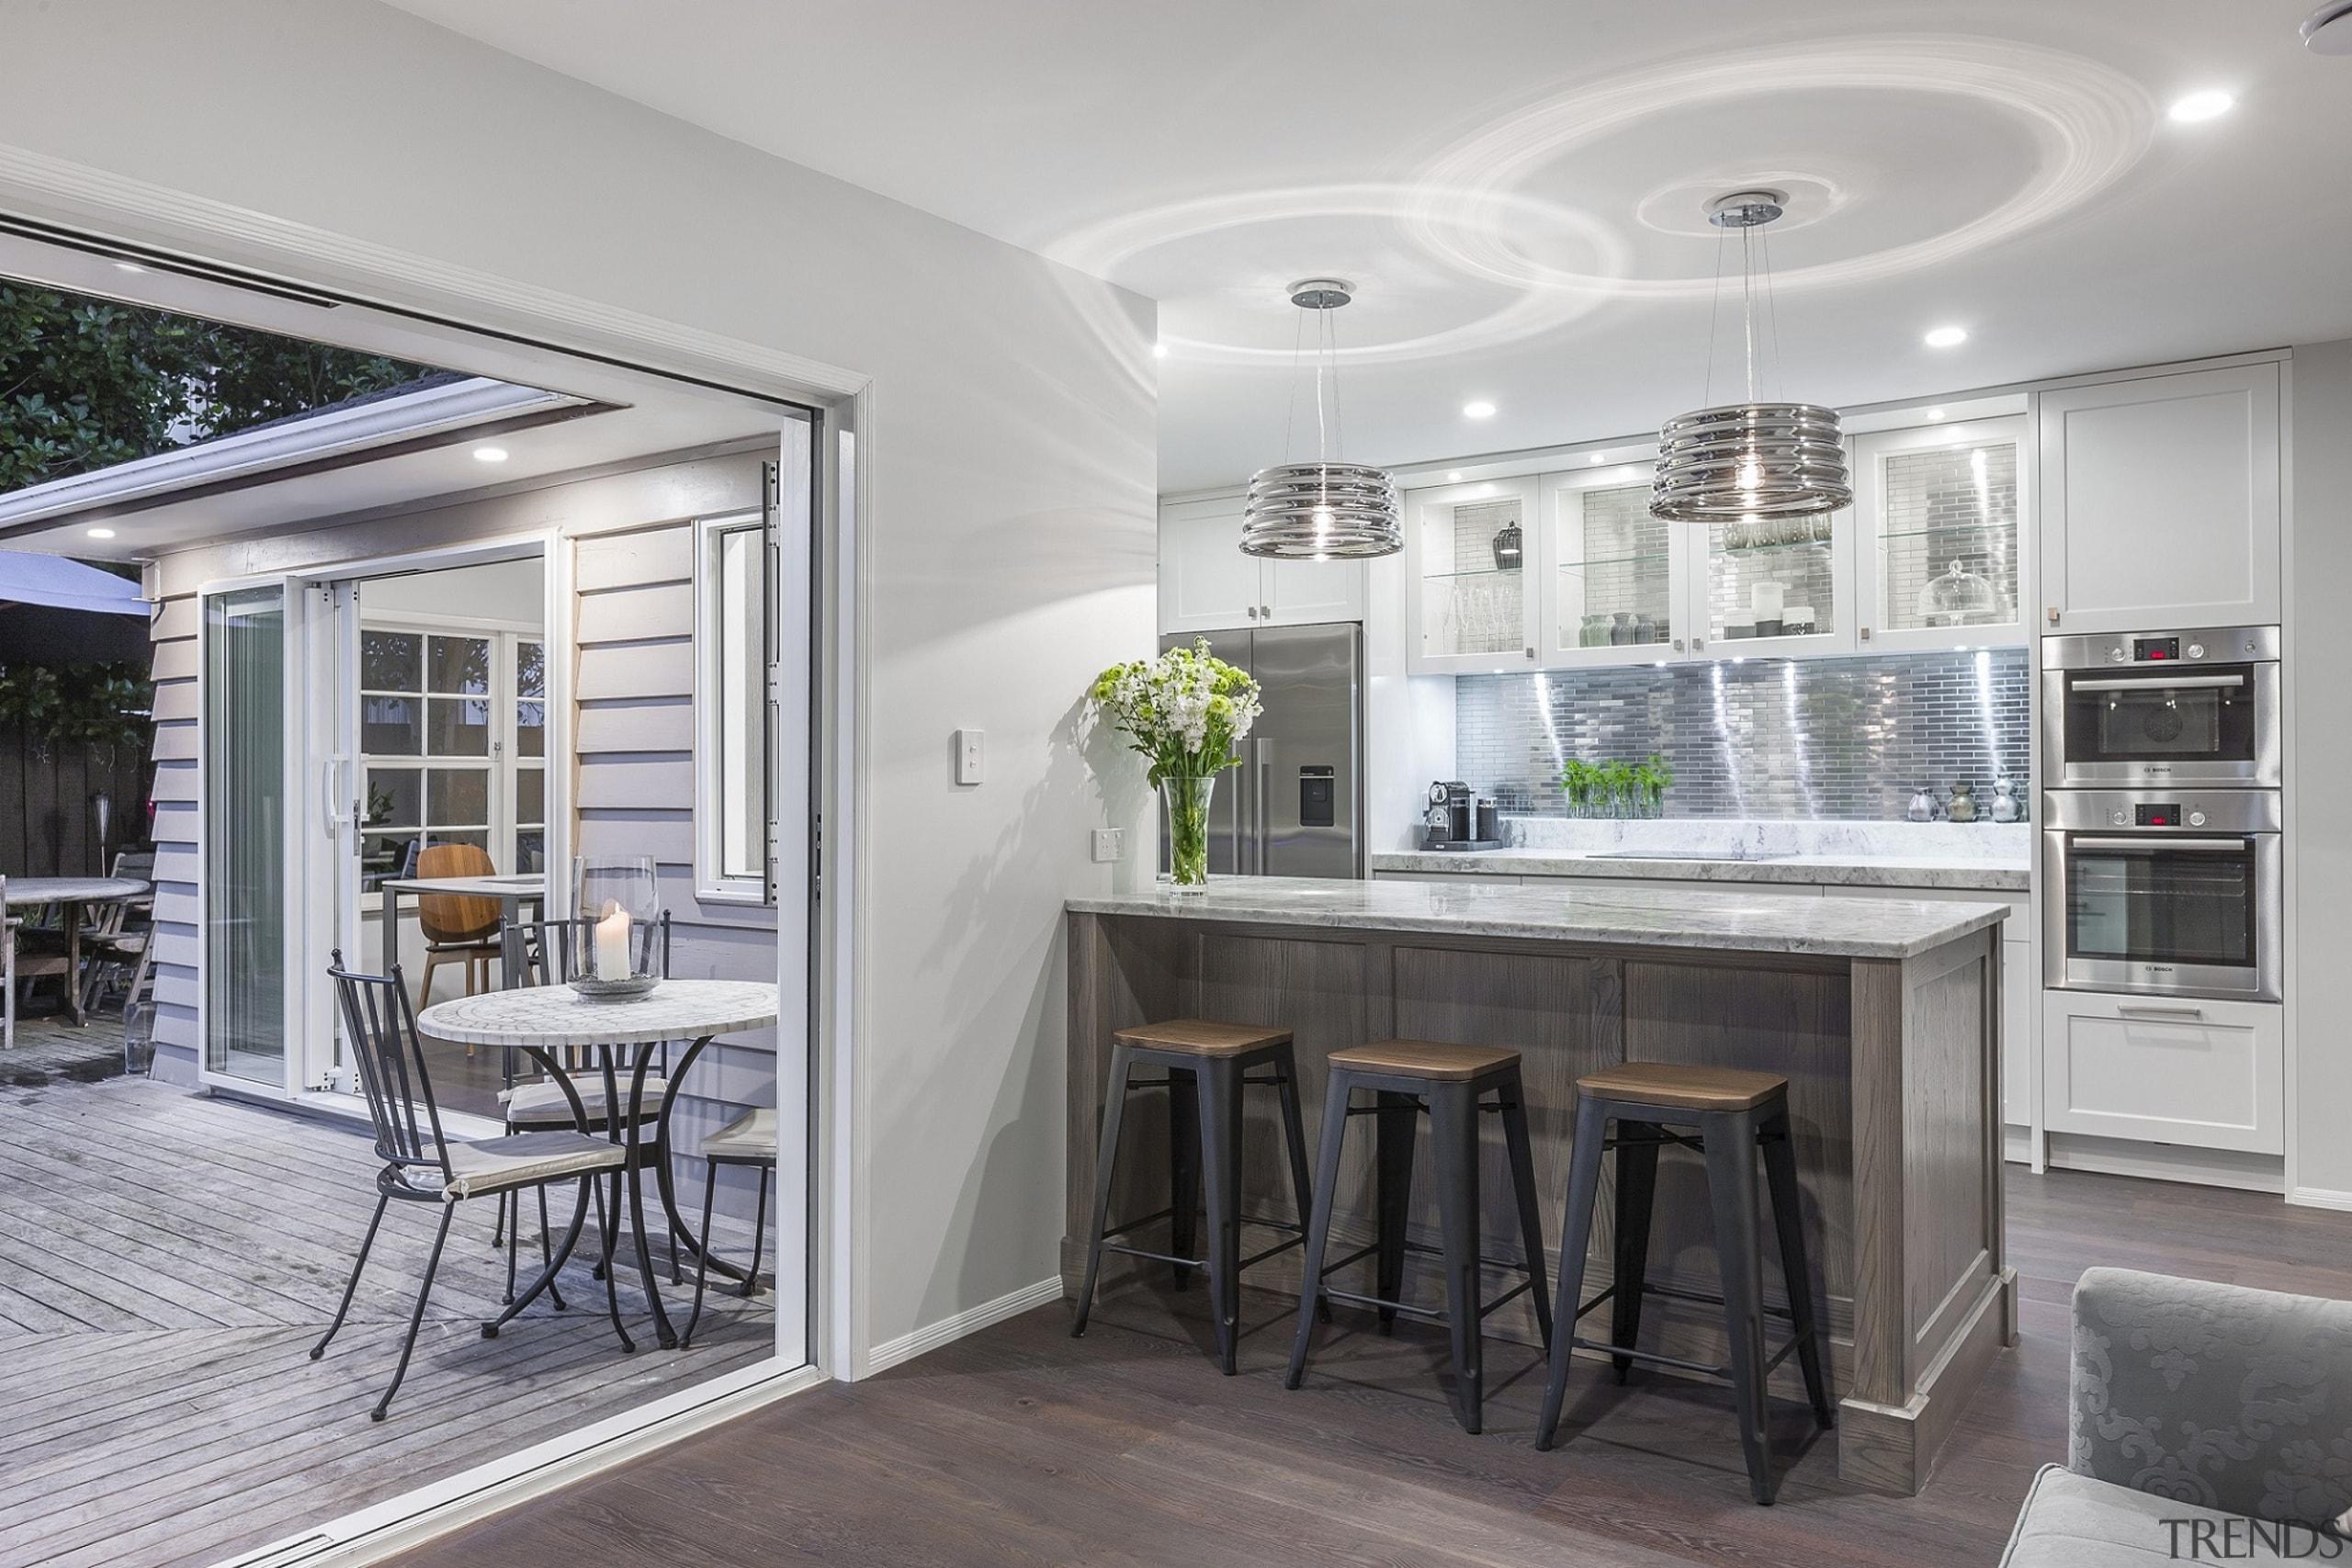 Sunnyhills II - countertop | interior design | countertop, interior design, kitchen, real estate, gray